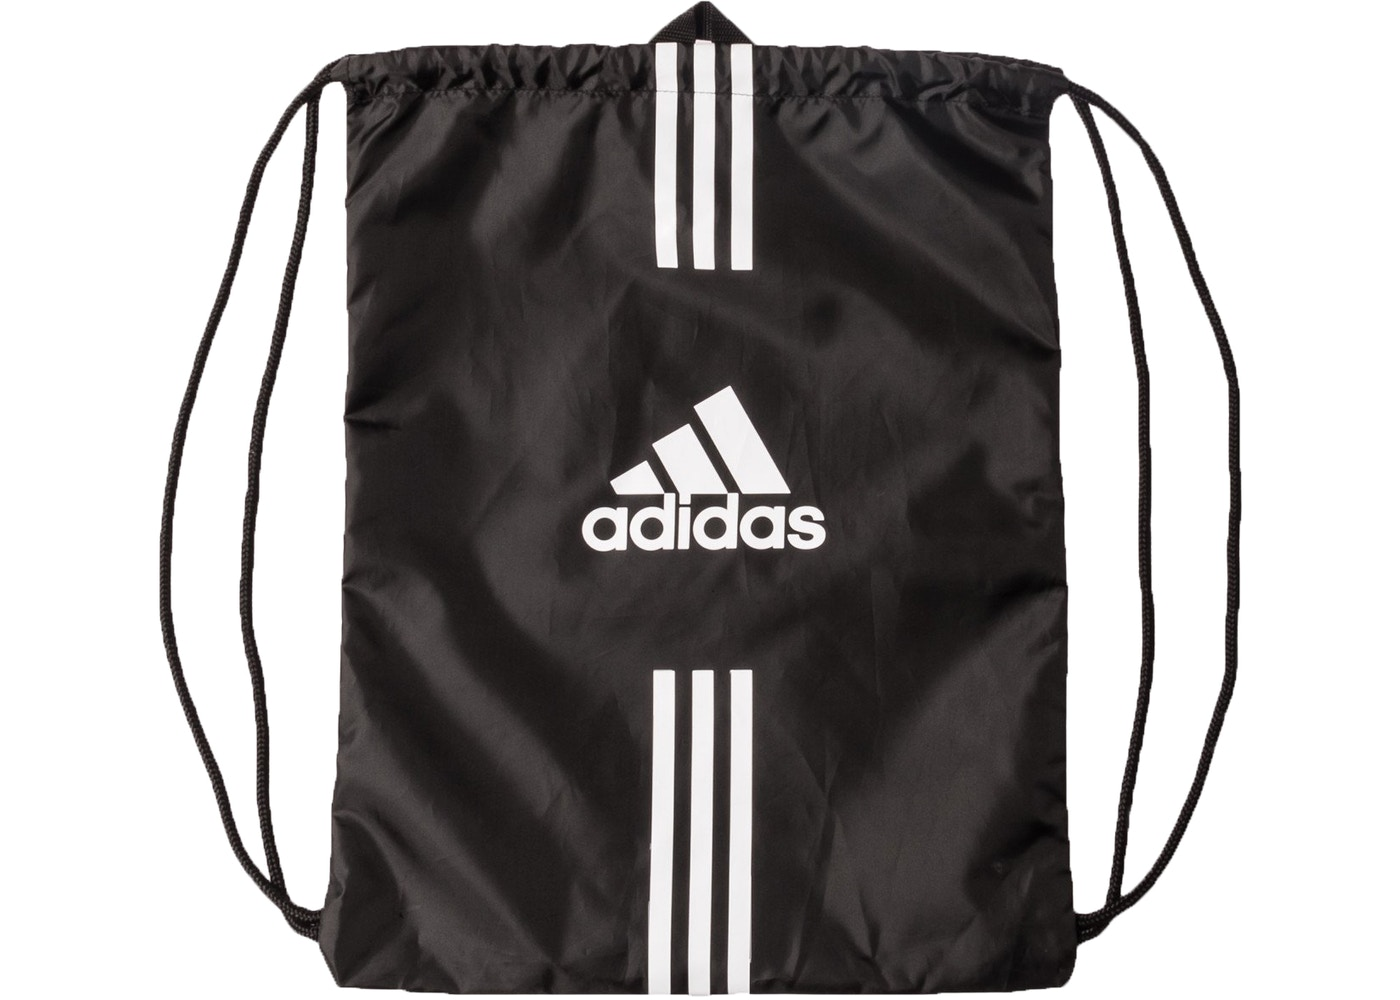 Kith Adidas Soccer Drawstring Bag Black